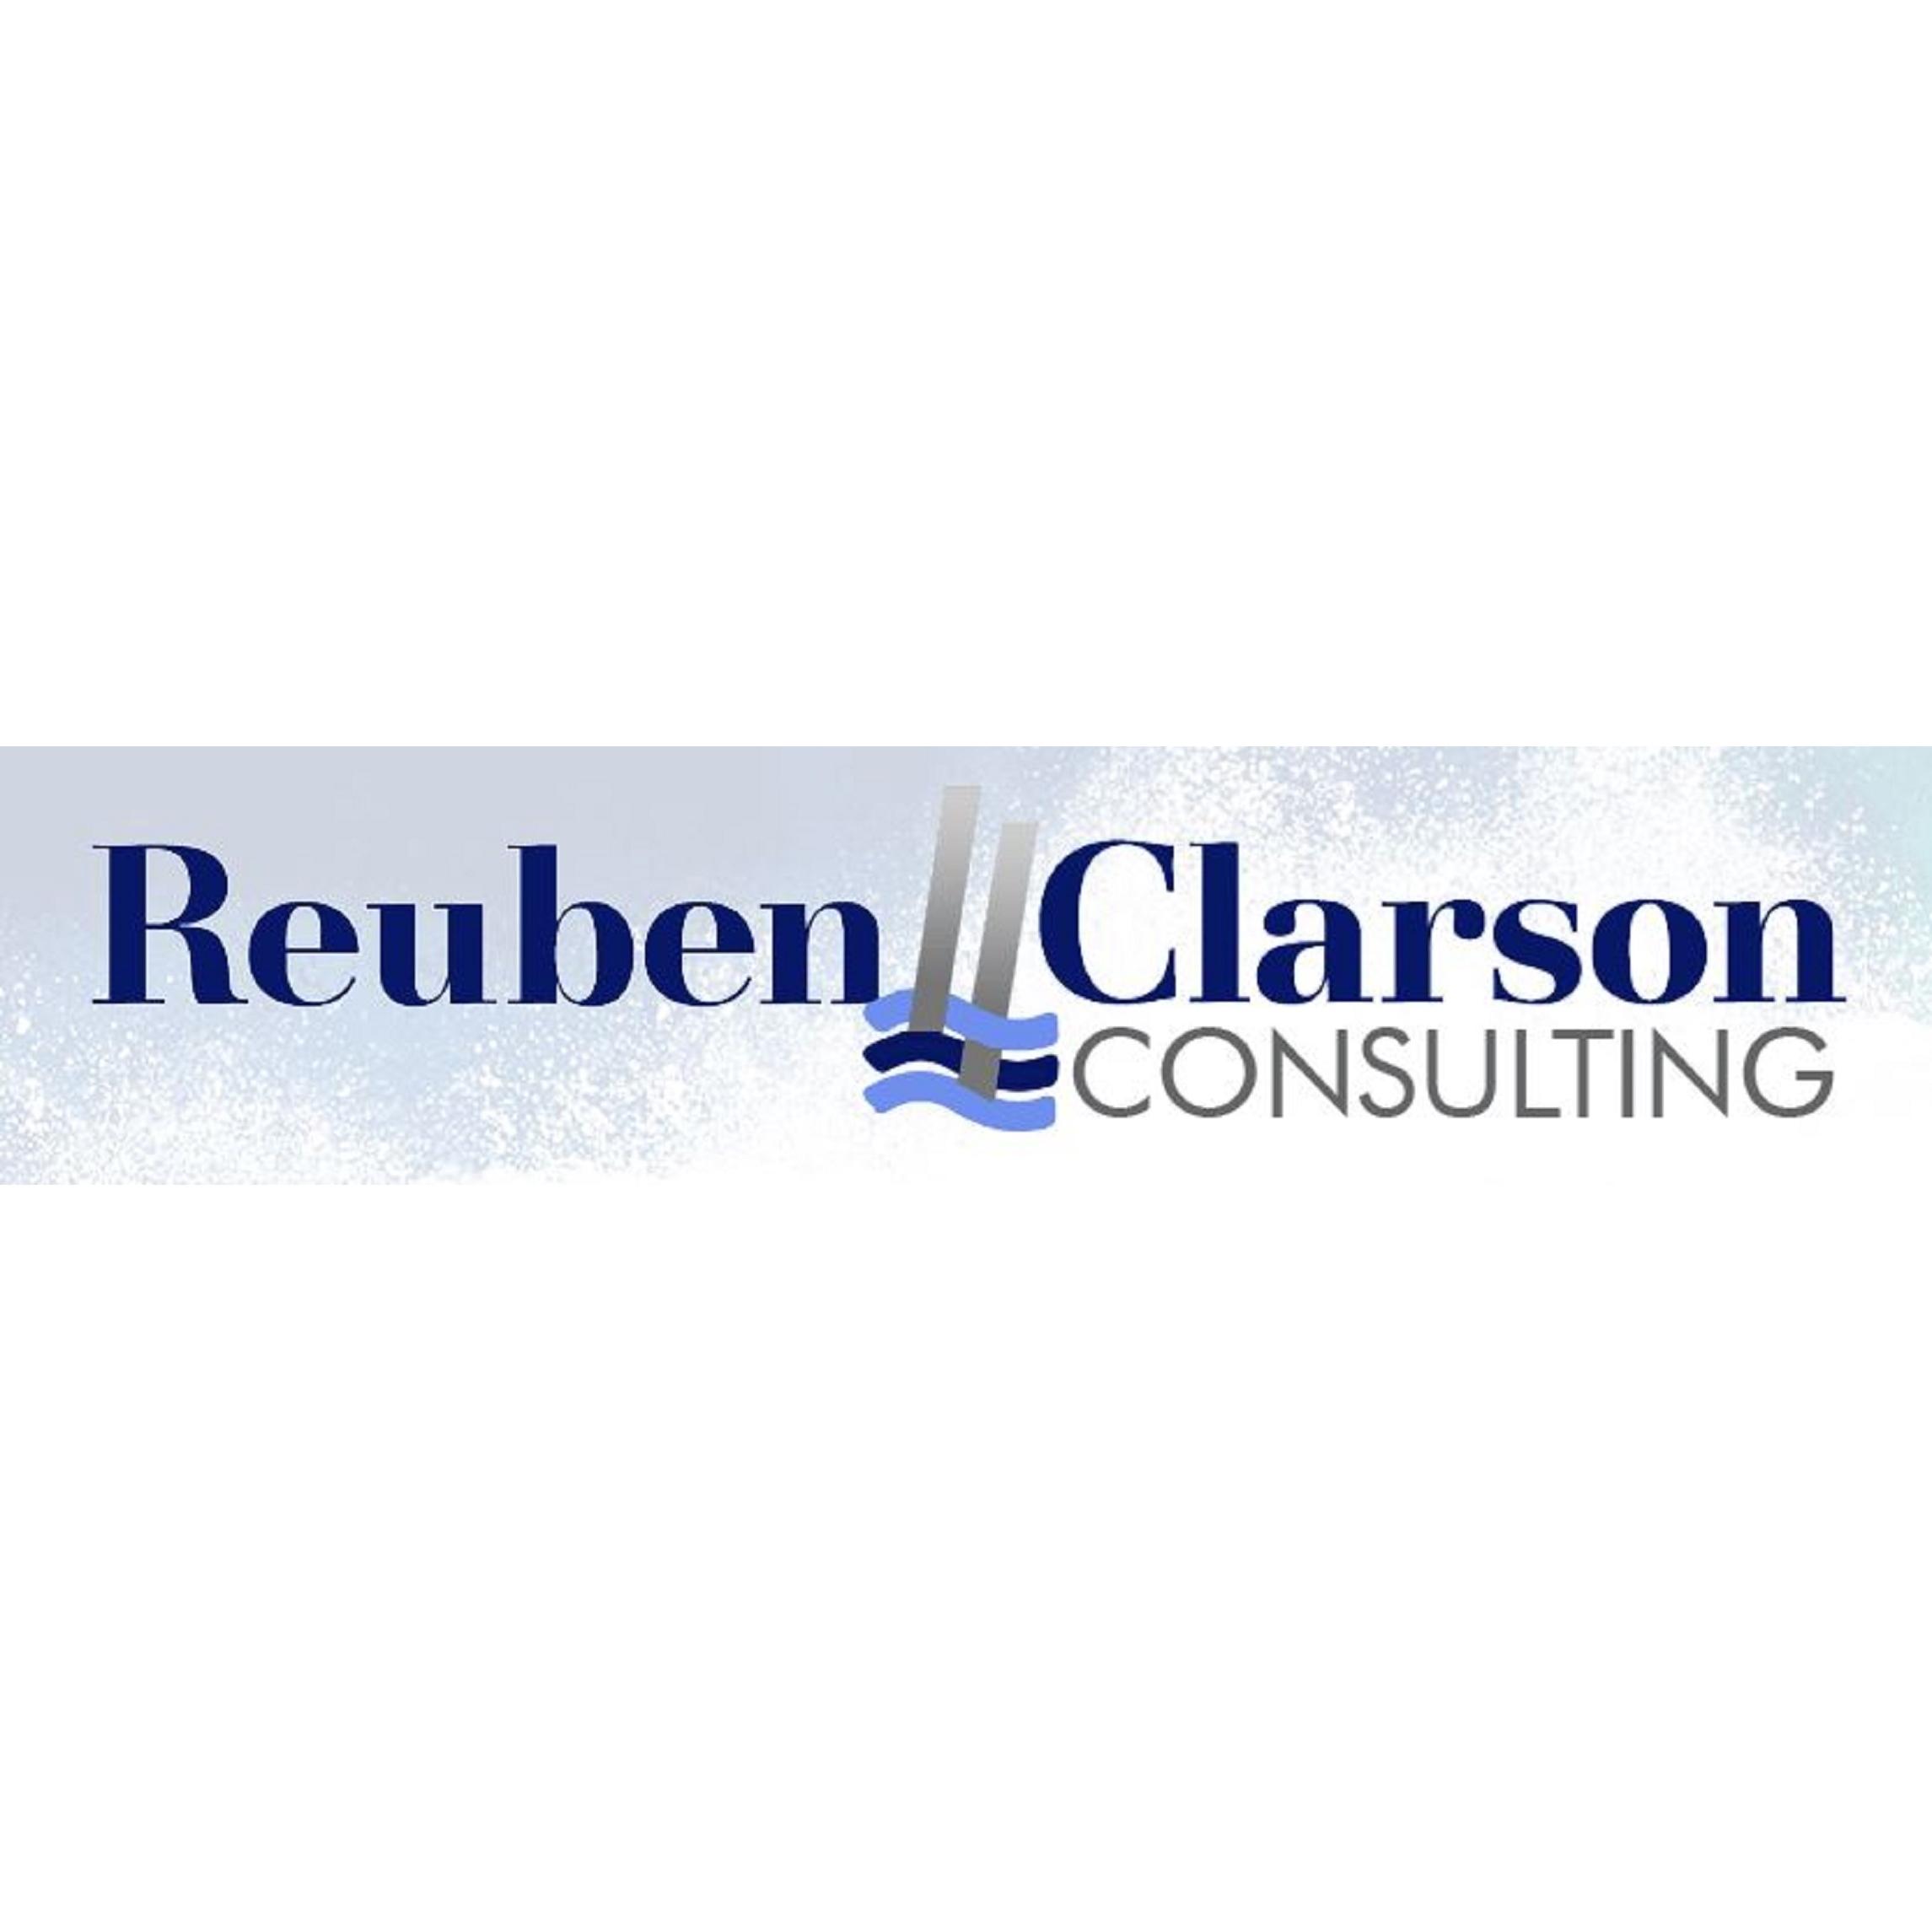 Clarson Reuben Consulting - Saint Petersburg, FL - General Contractors